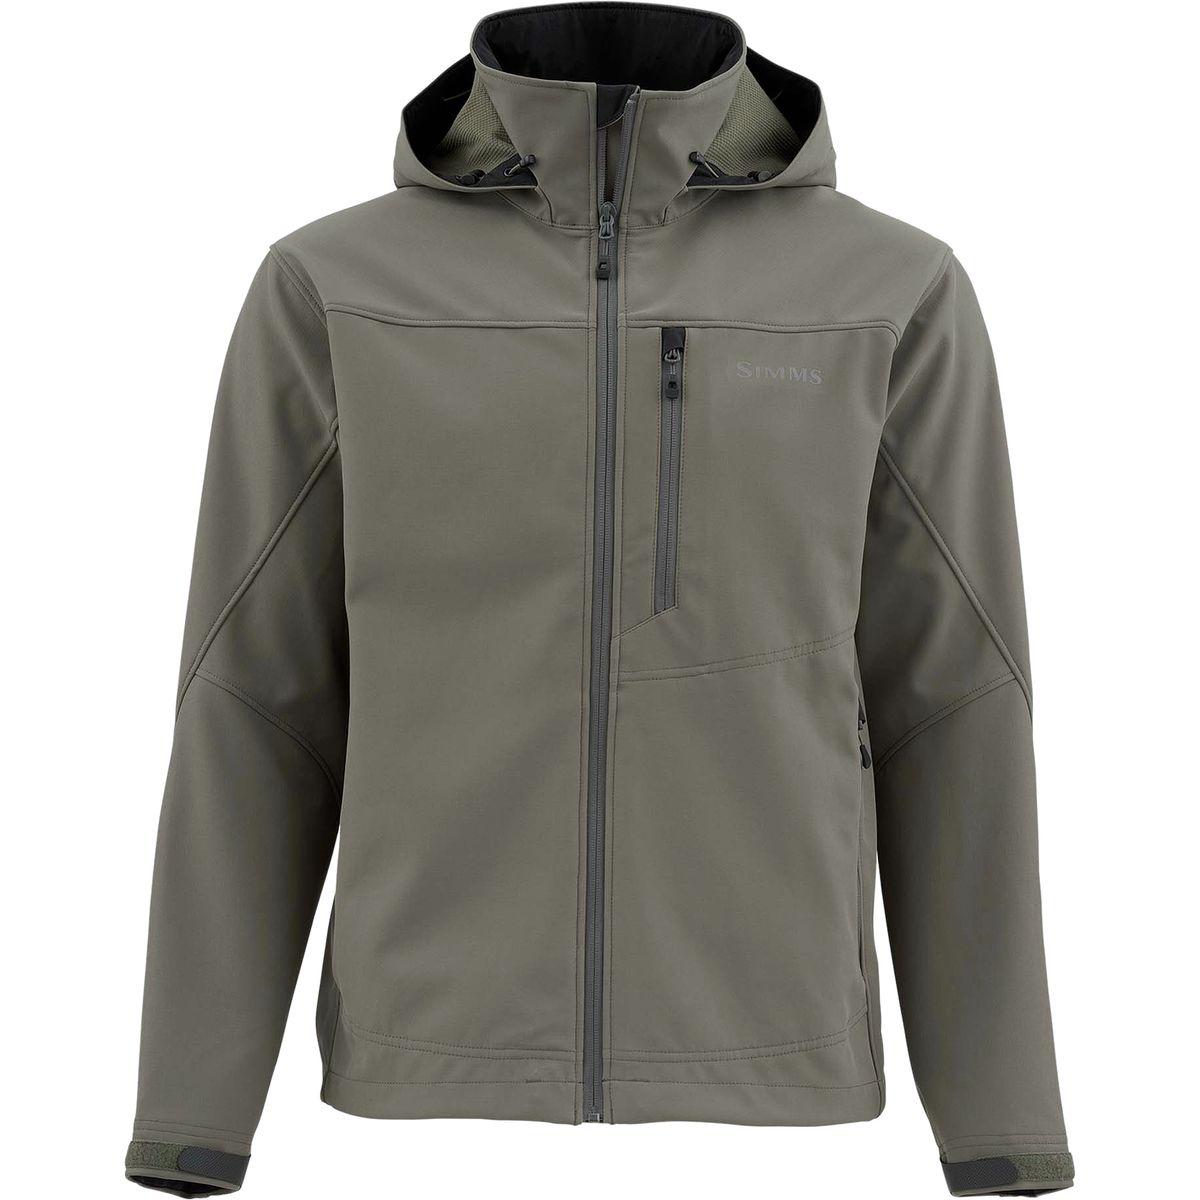 Simms Challenger Windbloc Hooded Jacket